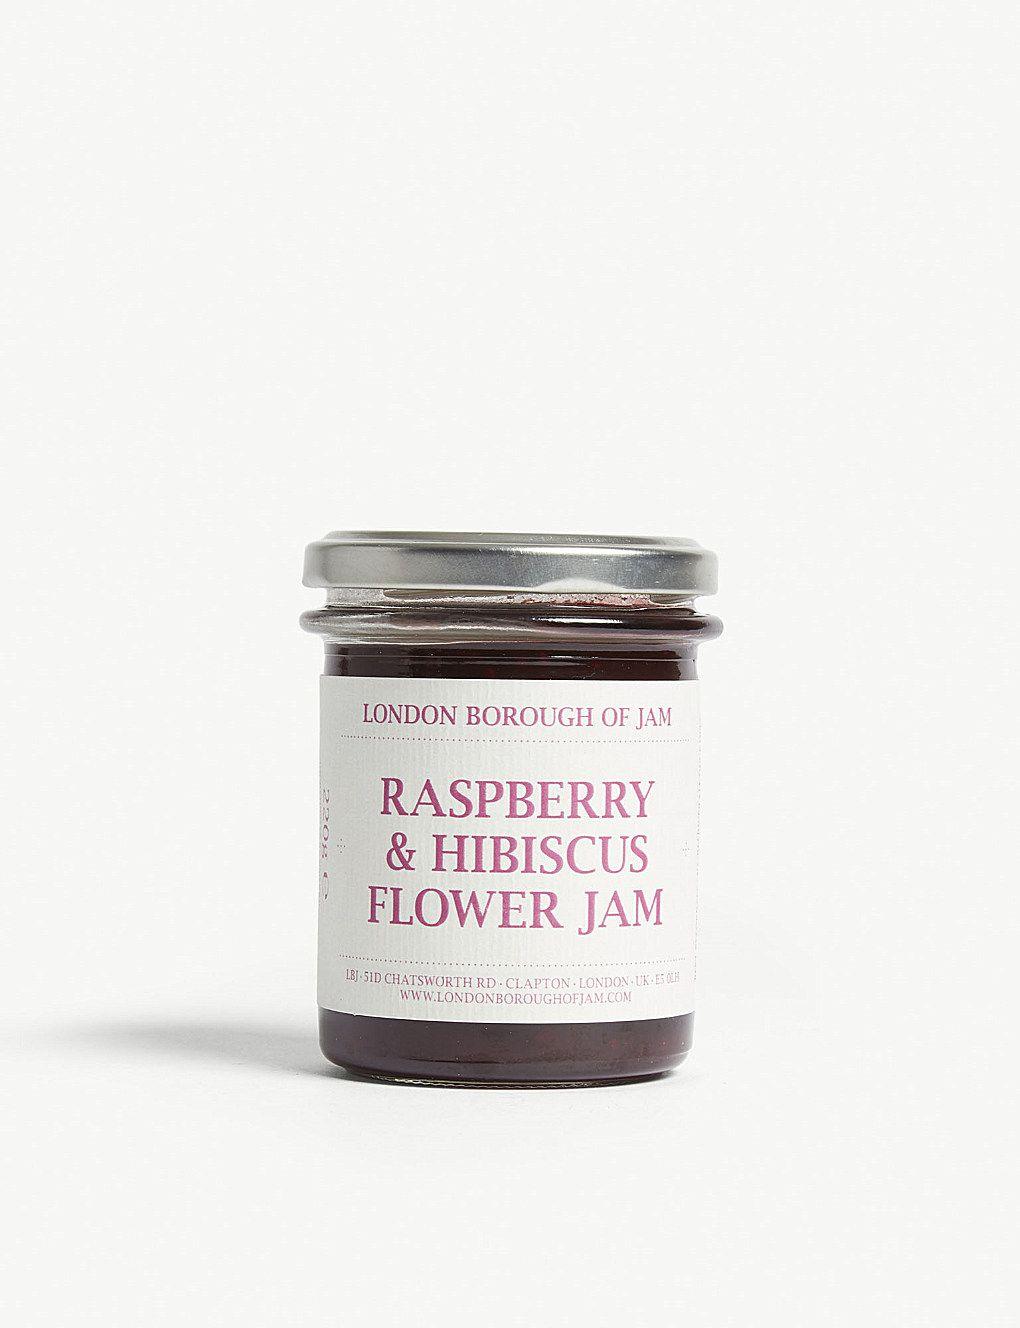 London Borough Jam Raspberry And Hibiscus Flower Jam 220g In 2020 Jam Jam Packaging Raspberry